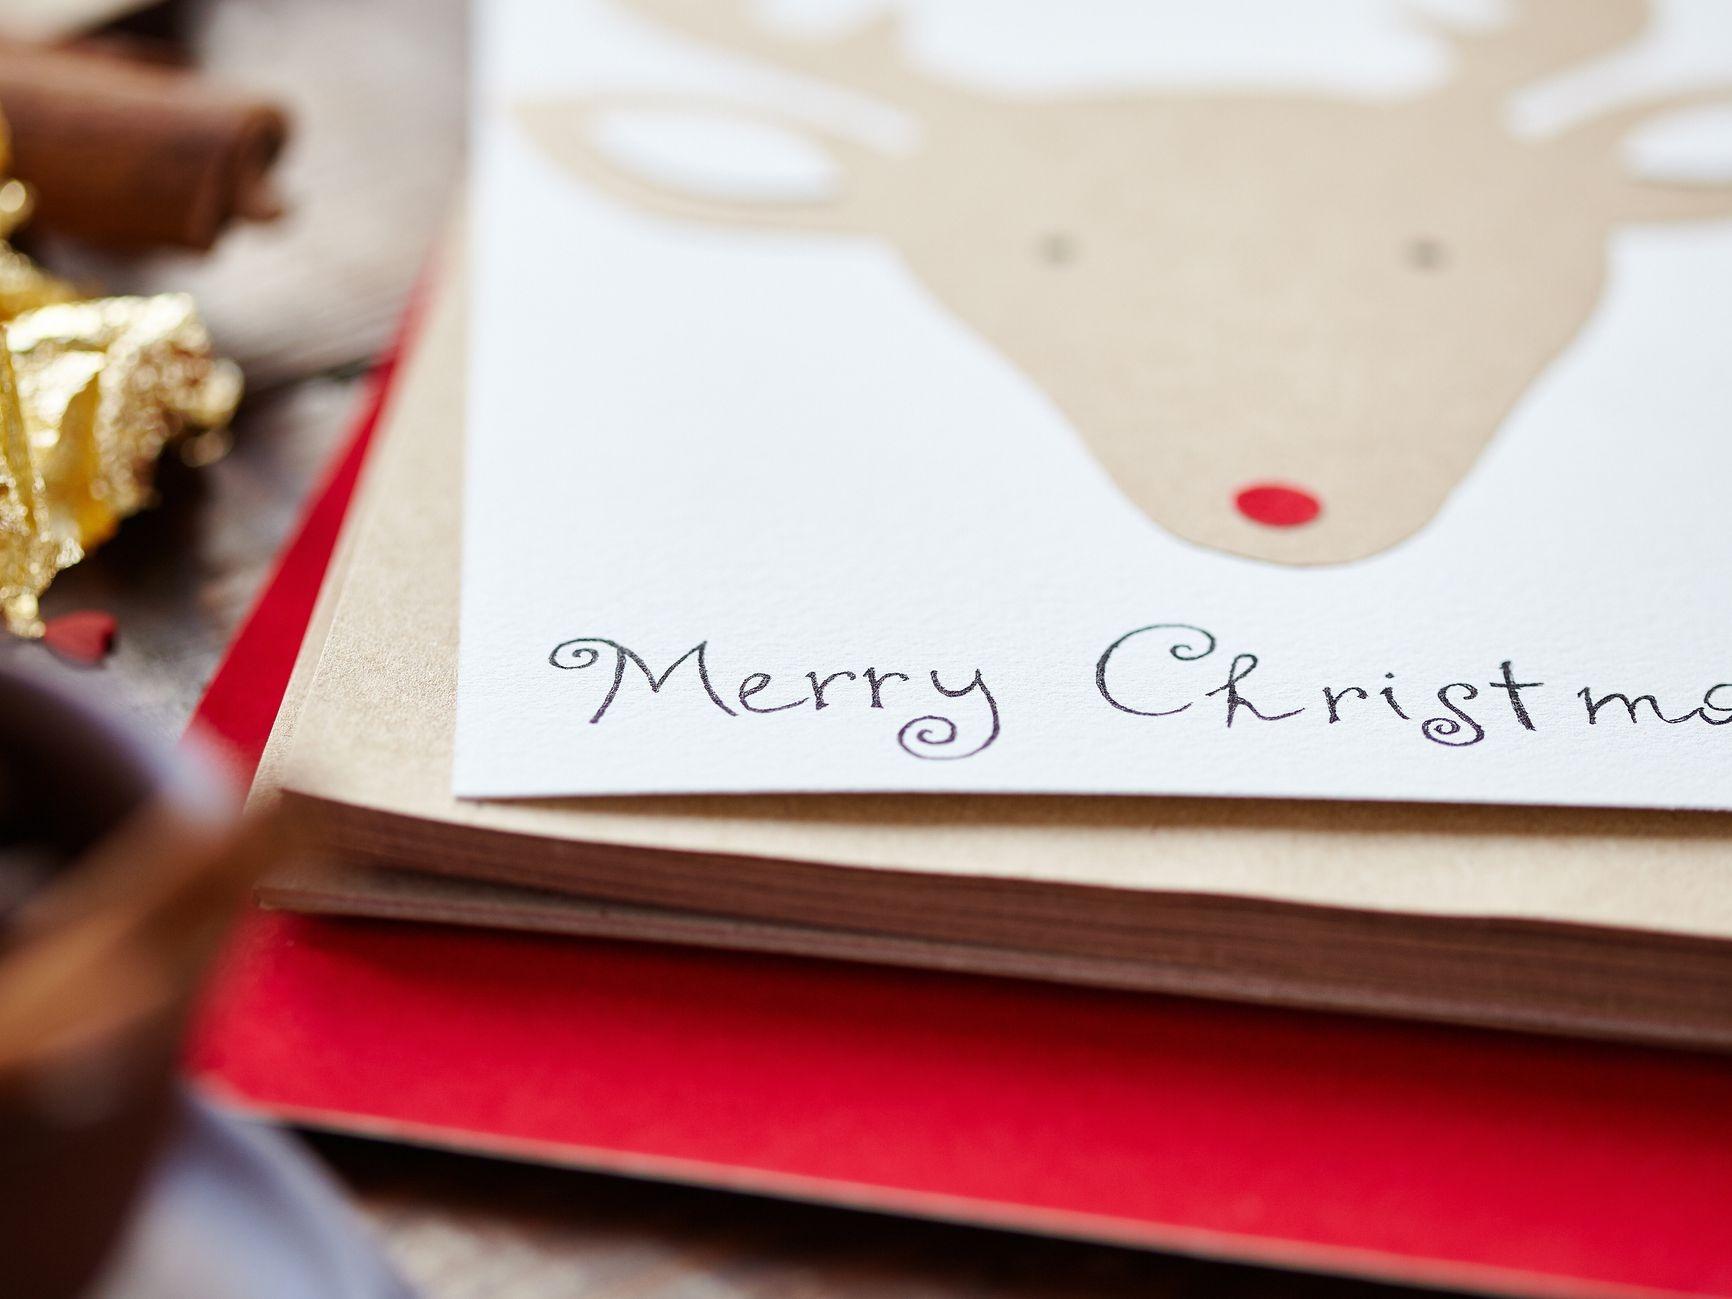 21 Free, Printable Christmas Cards To Send To Everyone - Free Printable Flat Christmas Cards